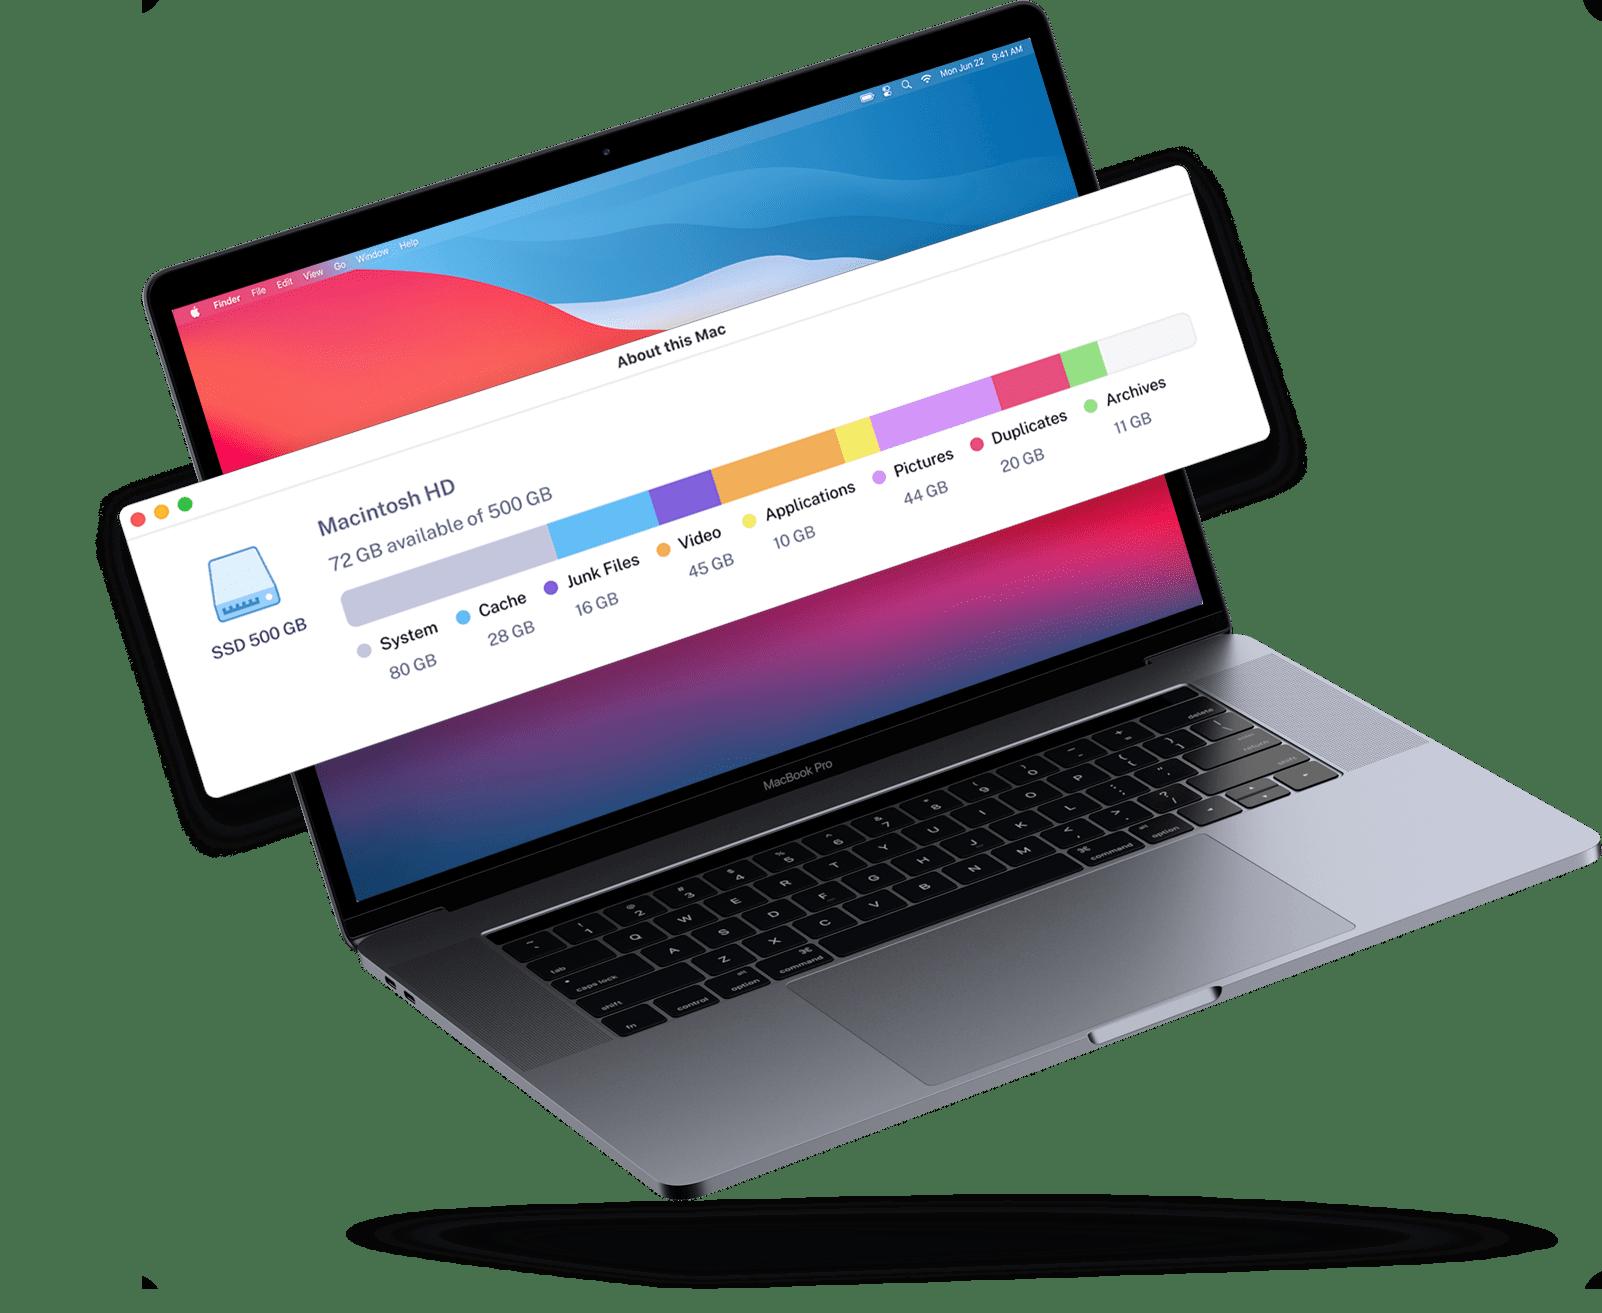 Macbook Pro storage panel